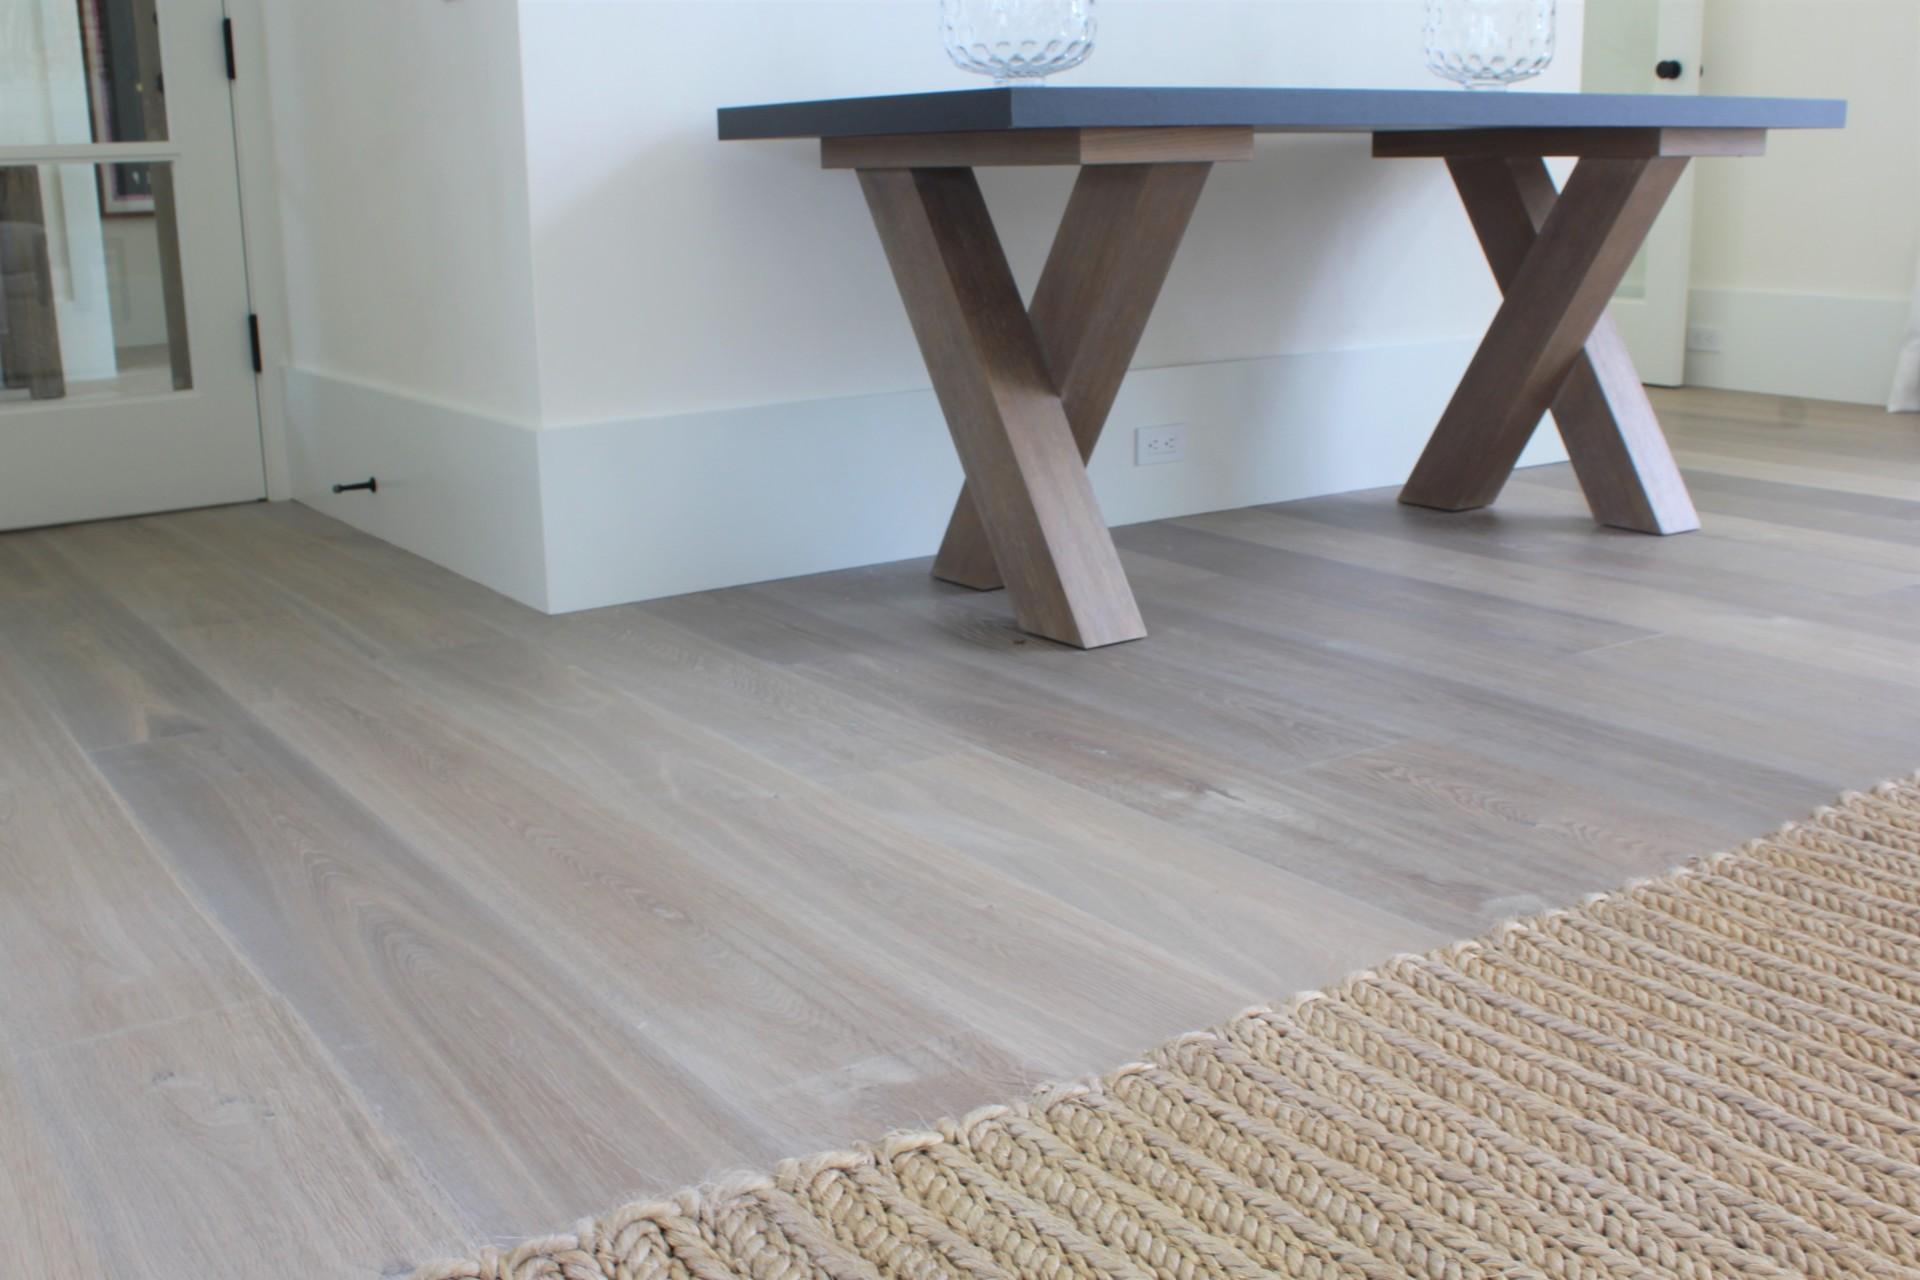 Hardwood, prefinished floor, engineered wood, solid wood, lifestyle, hard surface, prefinished hardwood, prefinished wood, home, area rug, design, interior design